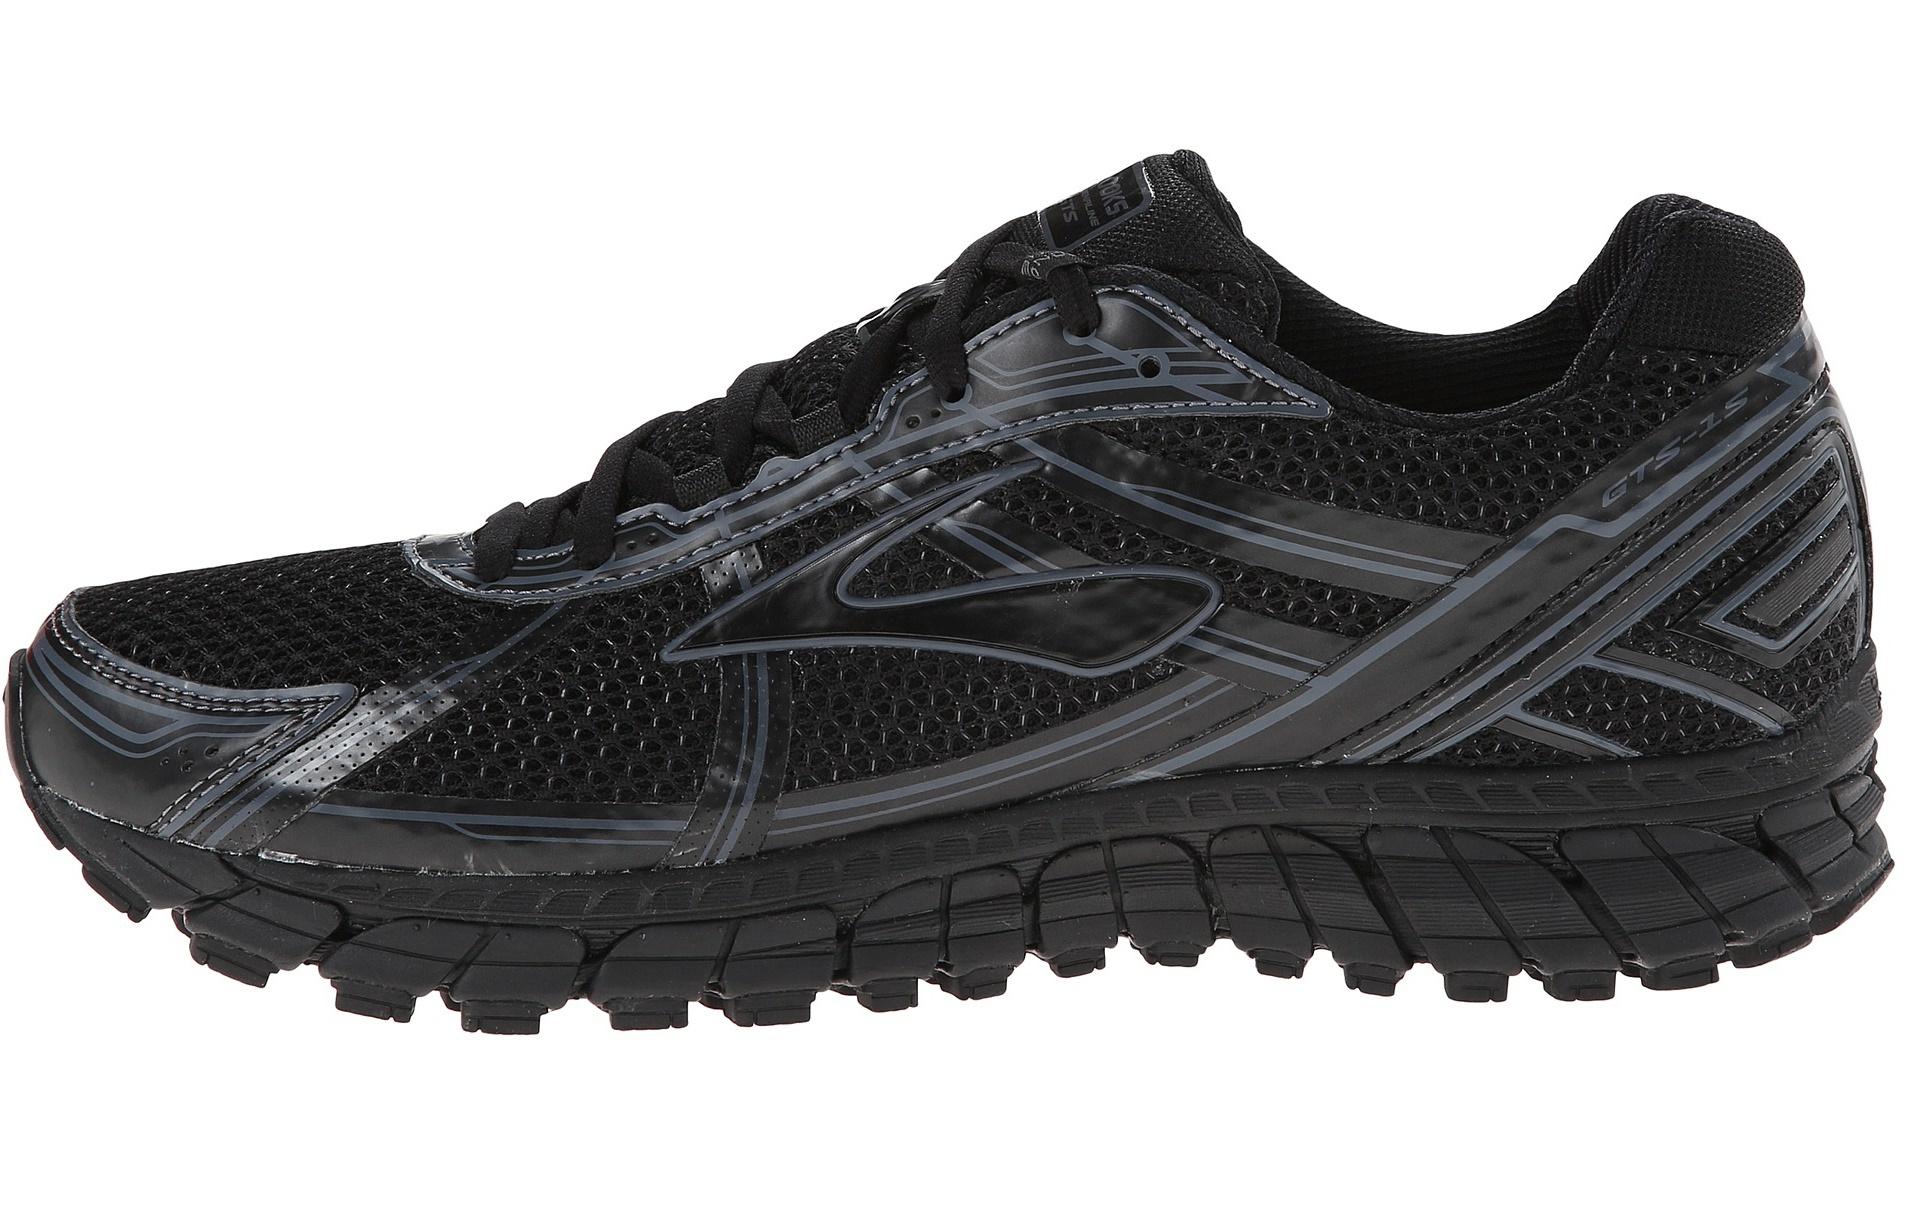 Мужская обувь для бега Brooks Adrenaline Gts 15 (101811D068) фото